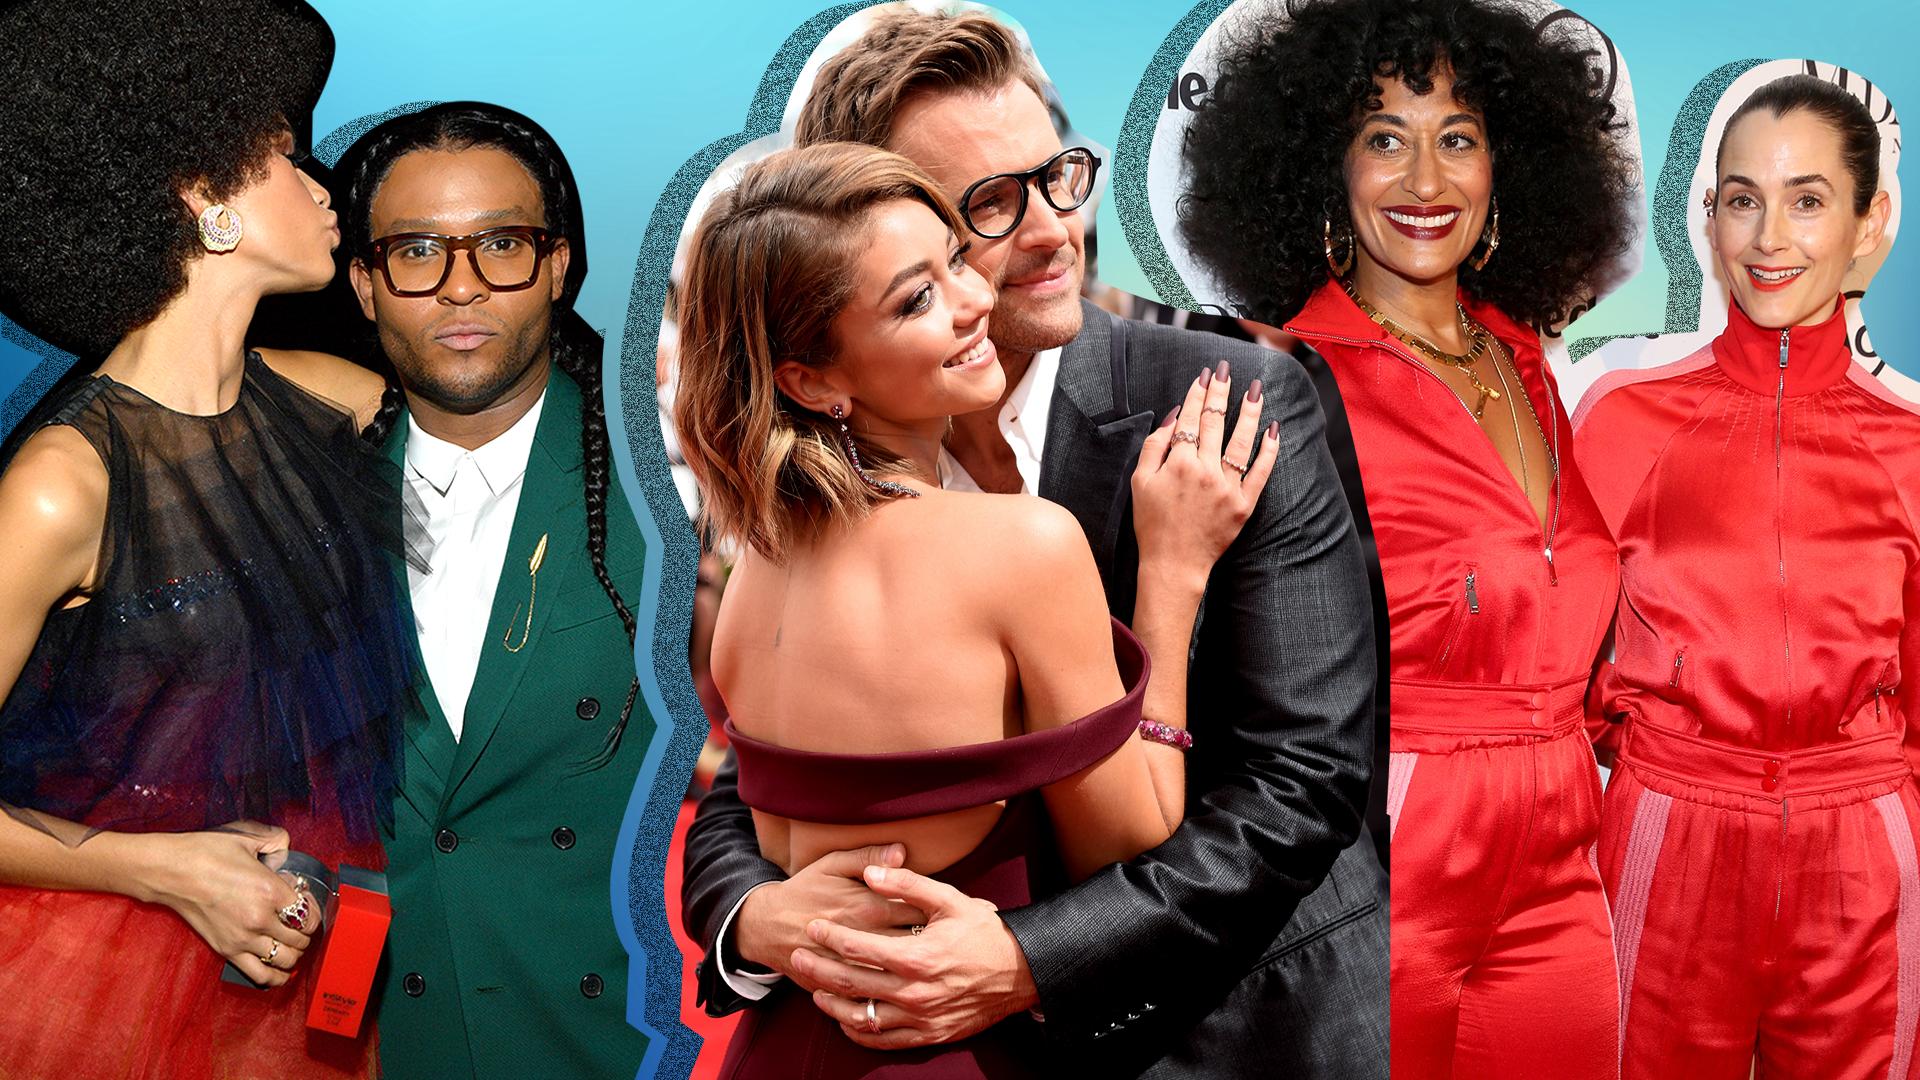 STYLECASTER | Best Celebrity Stylists to Follow on Instagram